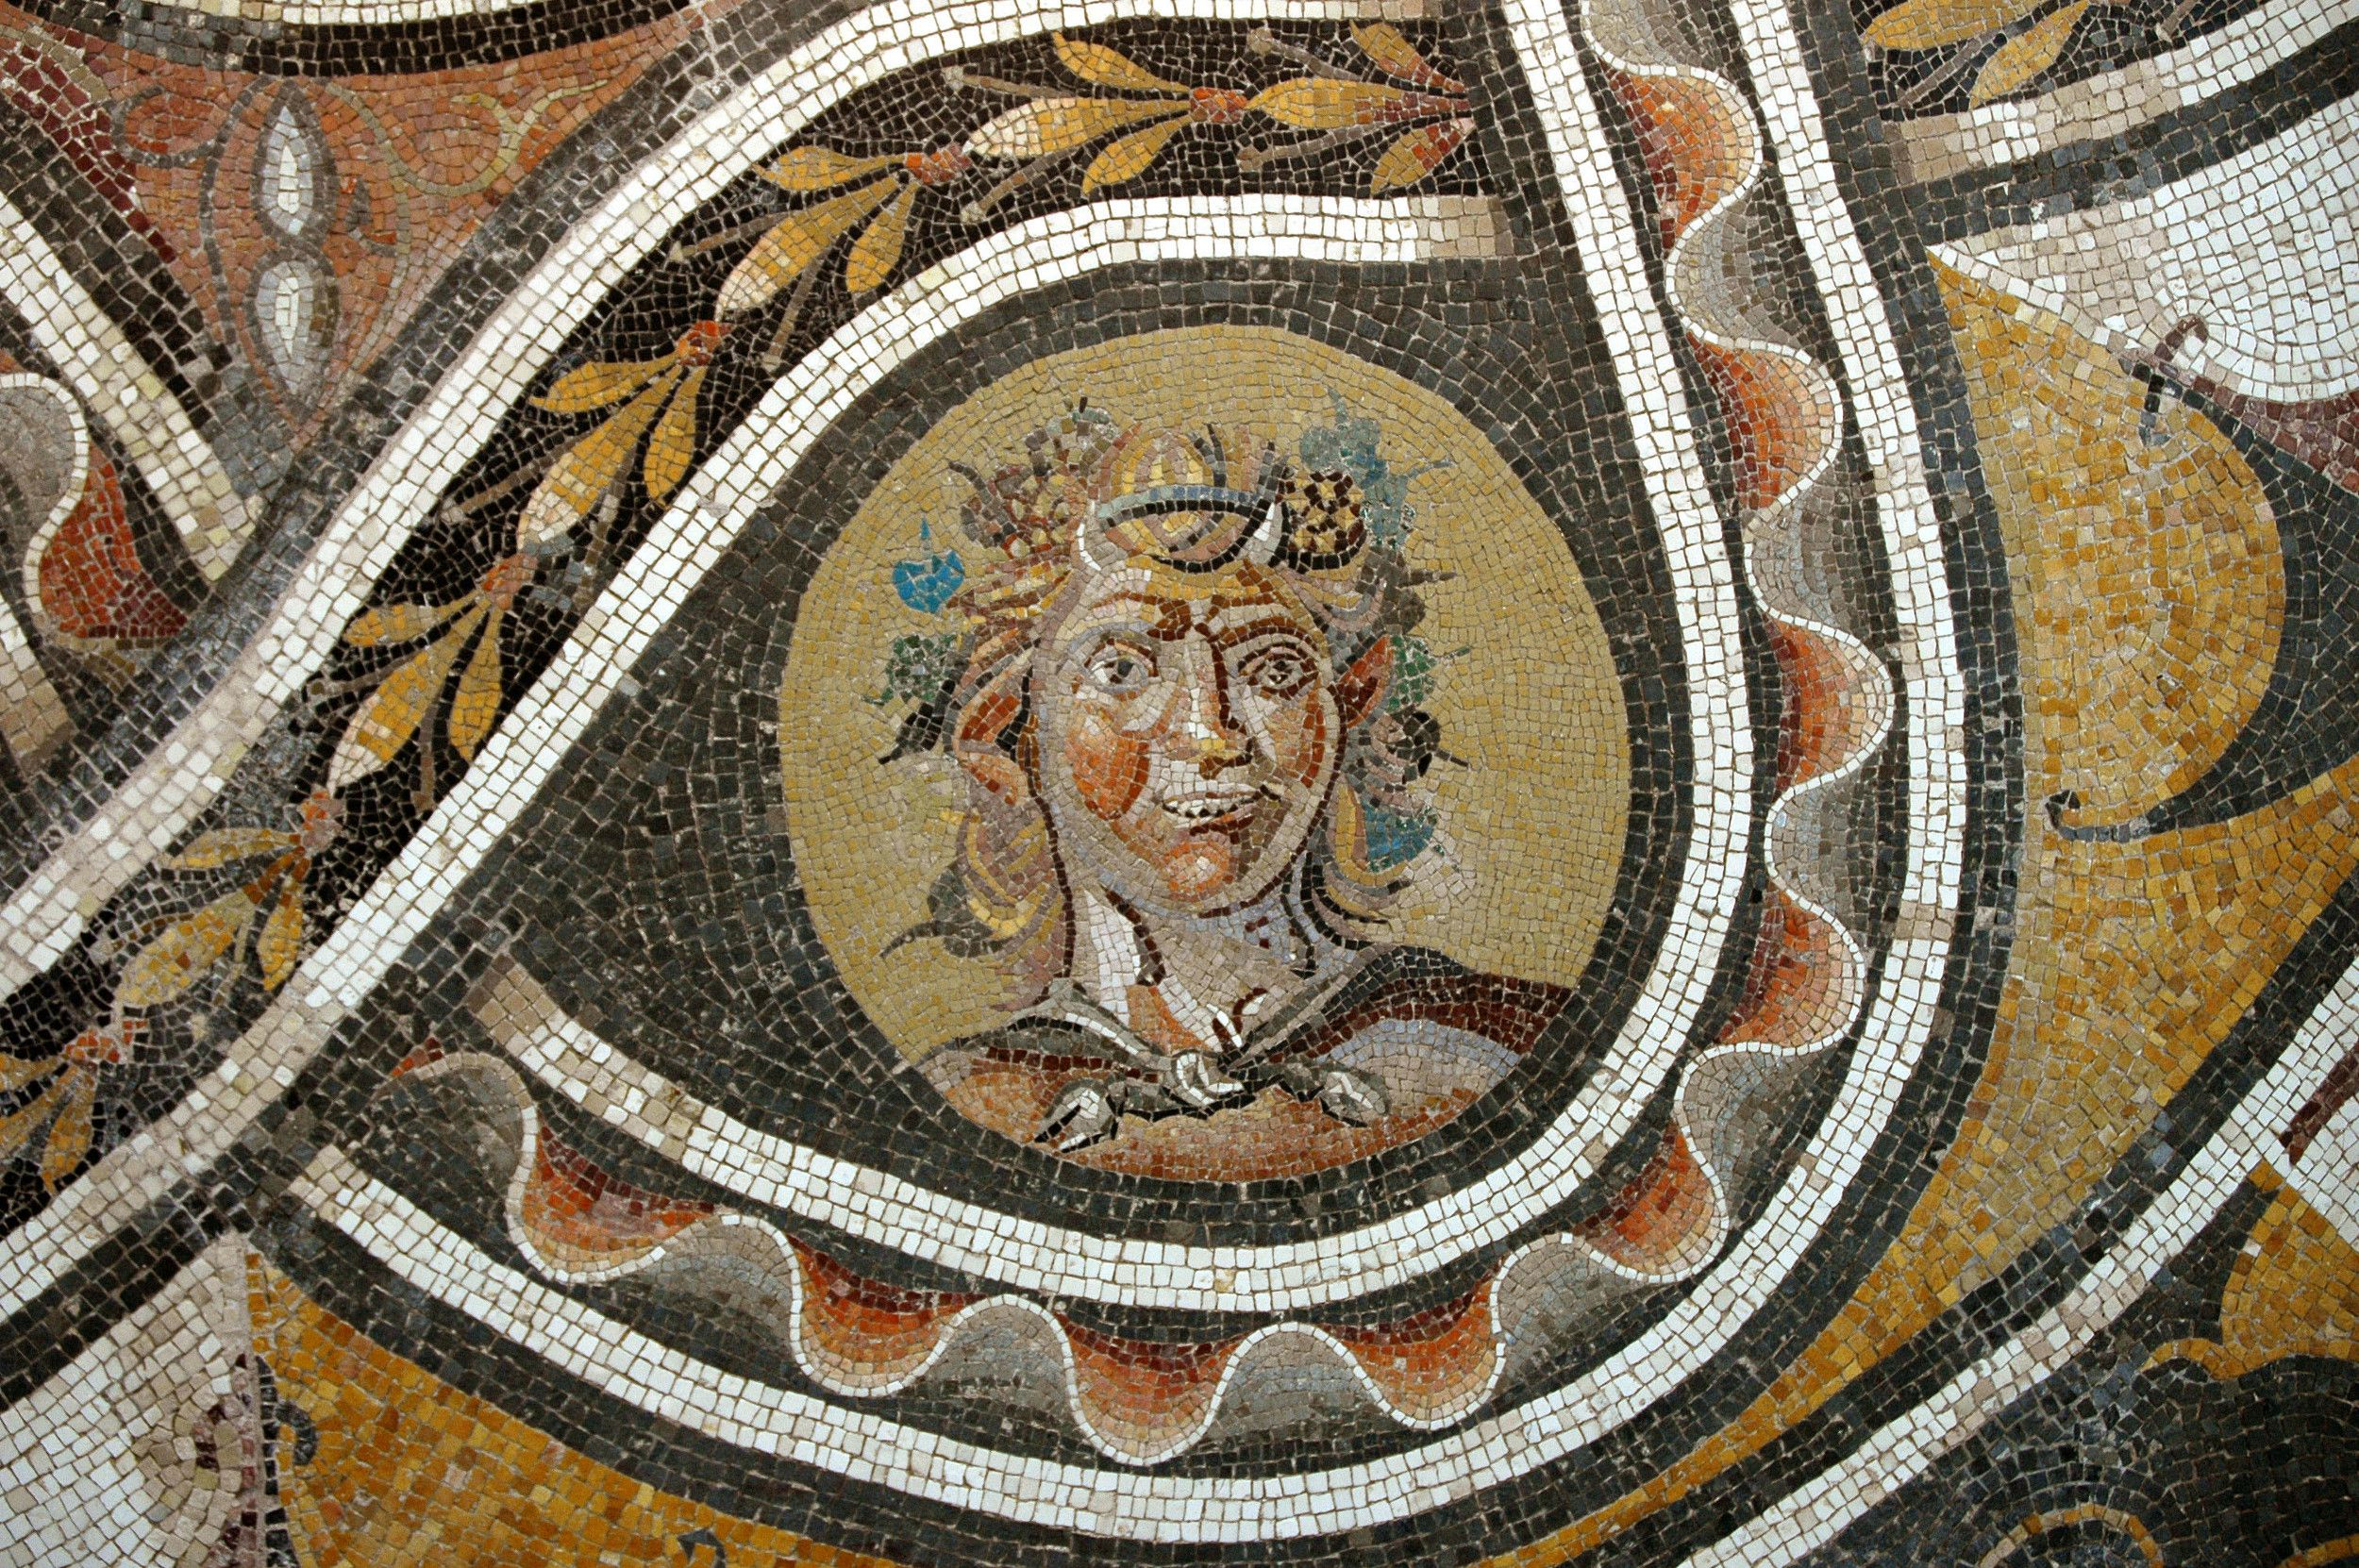 Roman Pavement Mosaic Depicting the God Bacchus